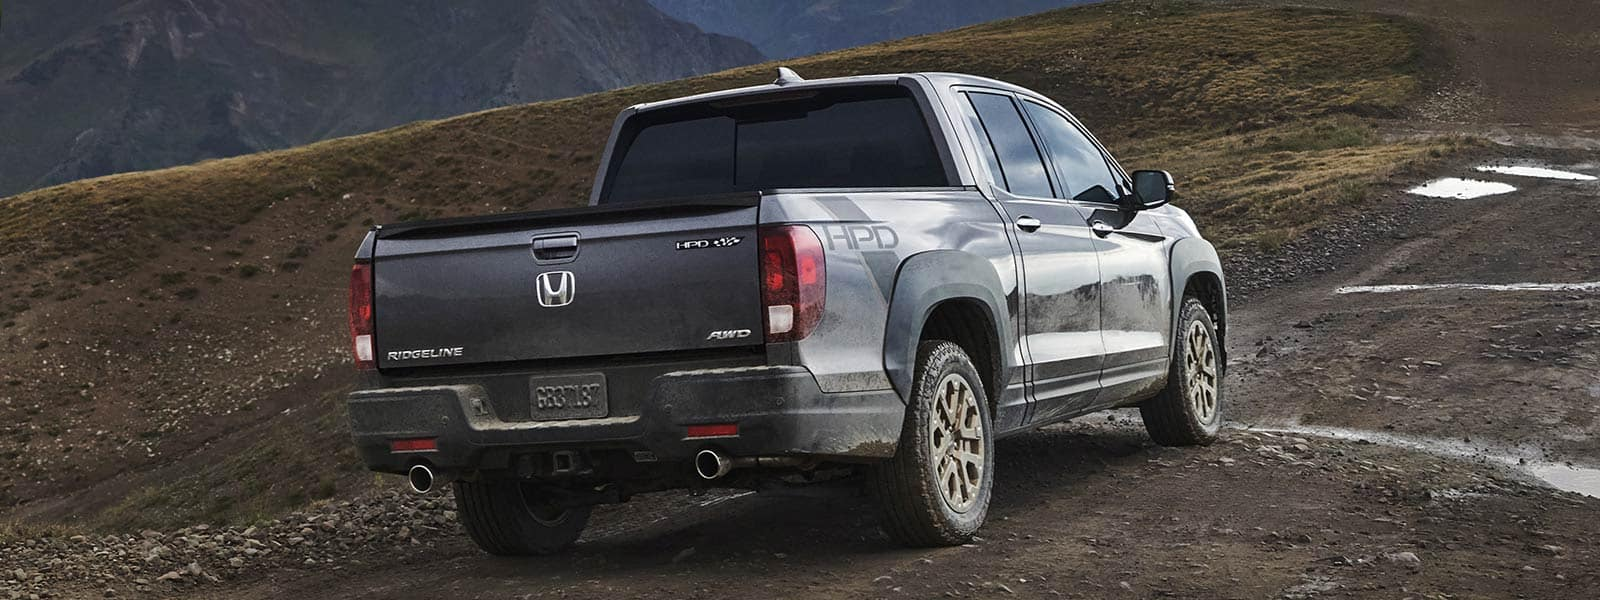 Buy new 2021 Honda Ridgeline in Martinsville Virginia